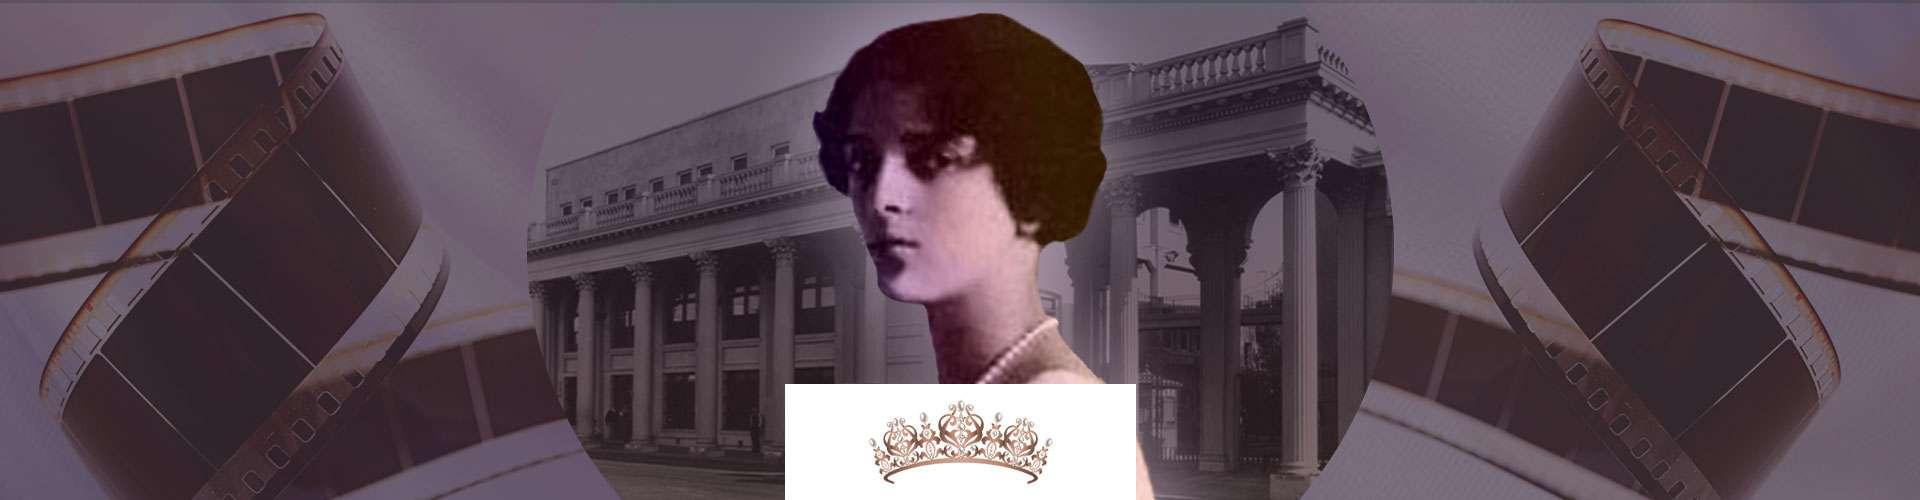 The Princess on the Witness Stand: Irina Yusupova vs MGM